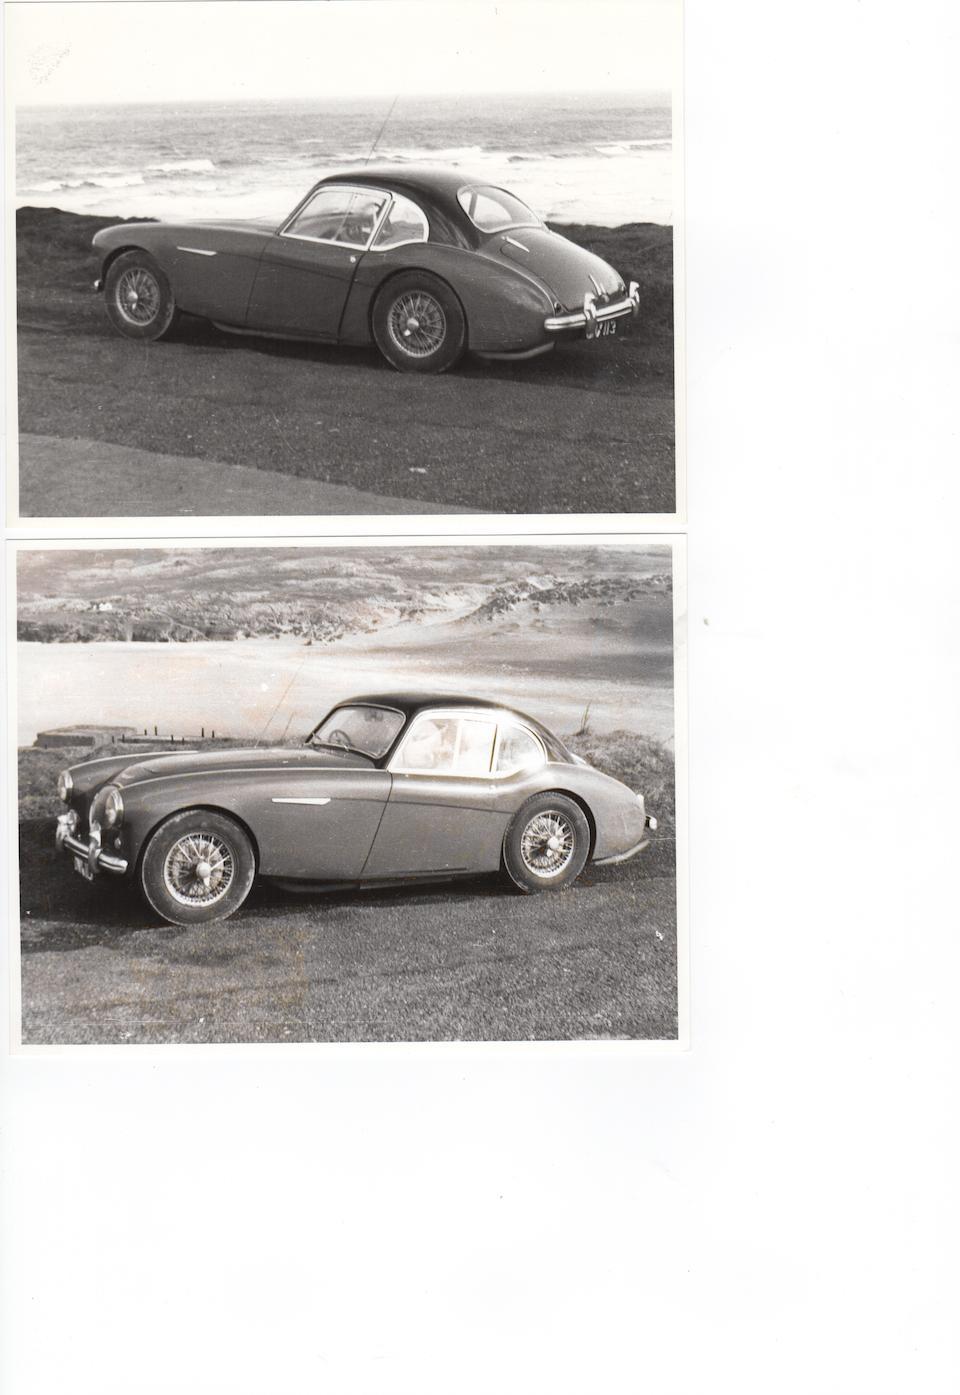 'ONX 113'- The ex-Donald Healey,1953 Austin-Healey 100/'100S' Coupé